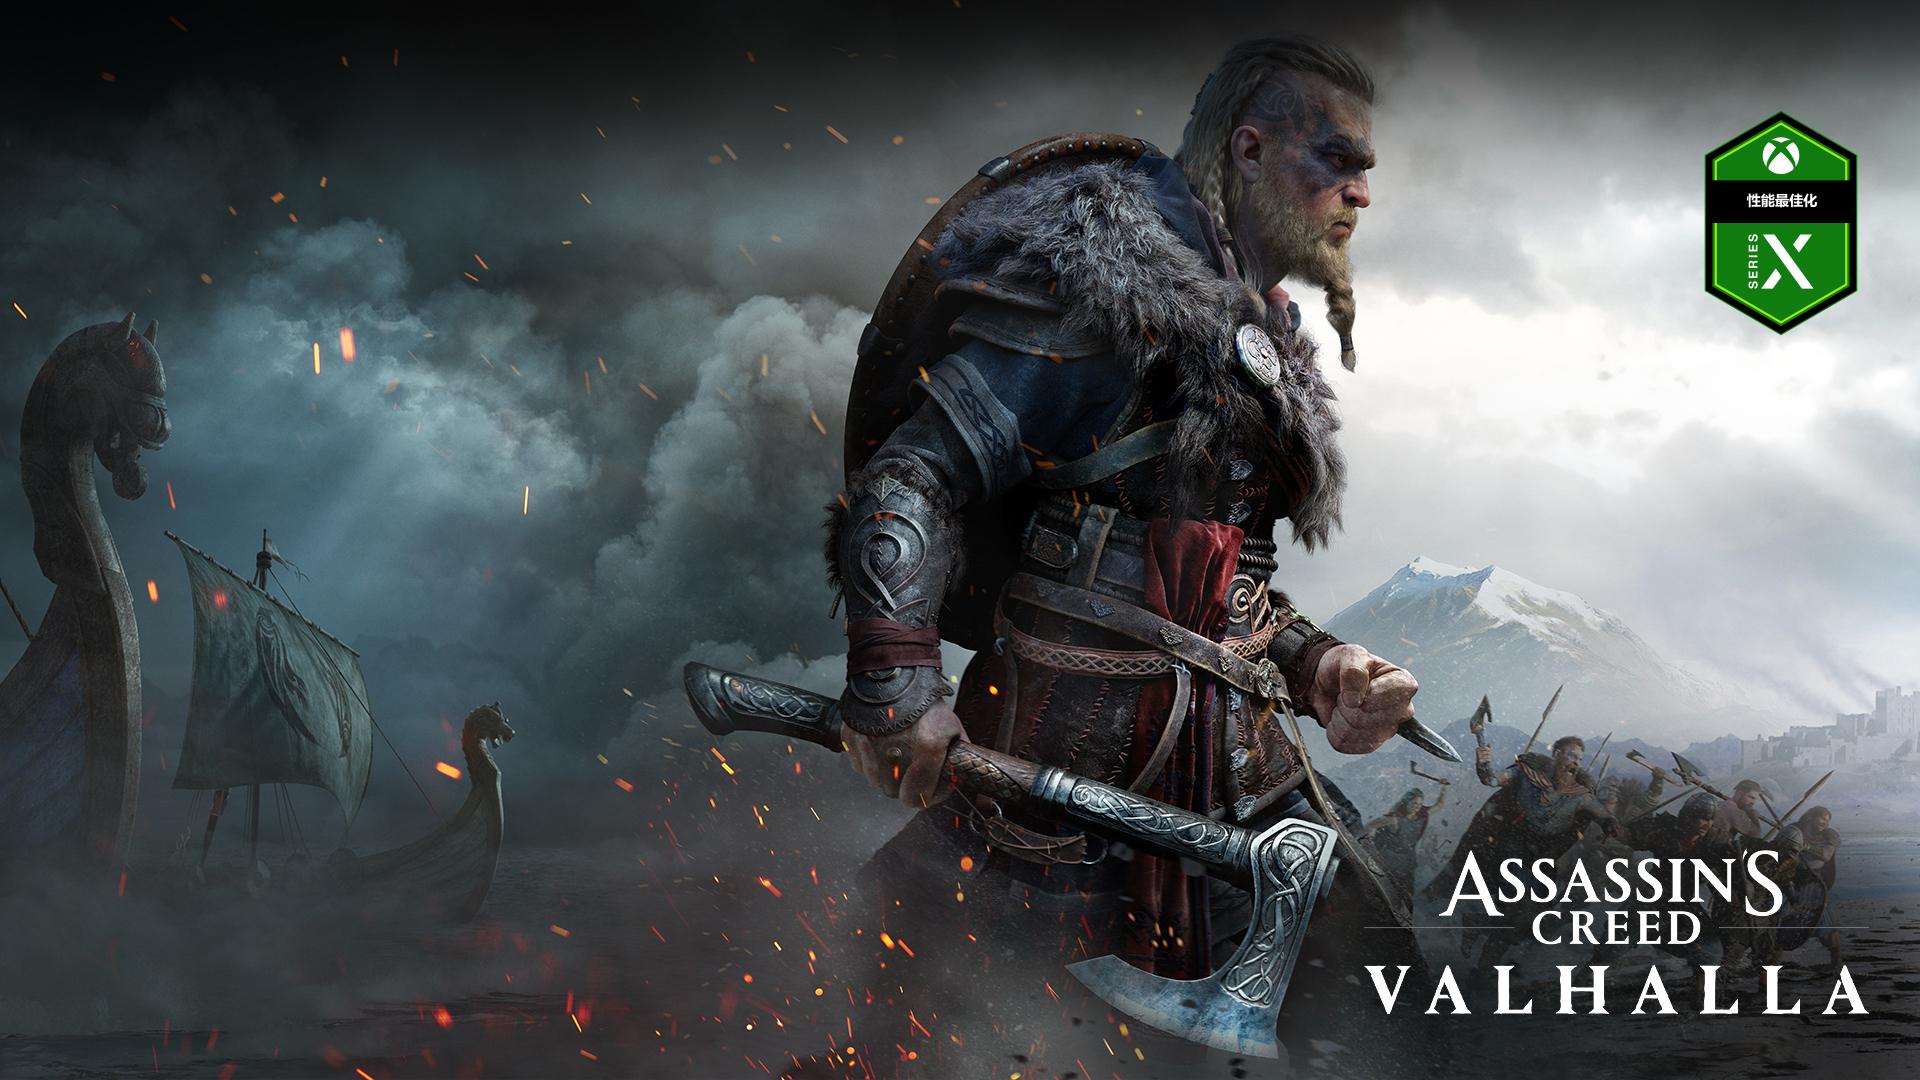 Xbox Series X 性能最佳化標誌,Assassin's Creed Valhalla,拿著斧頭的角色、濃霧中的船隻,以及戰爭